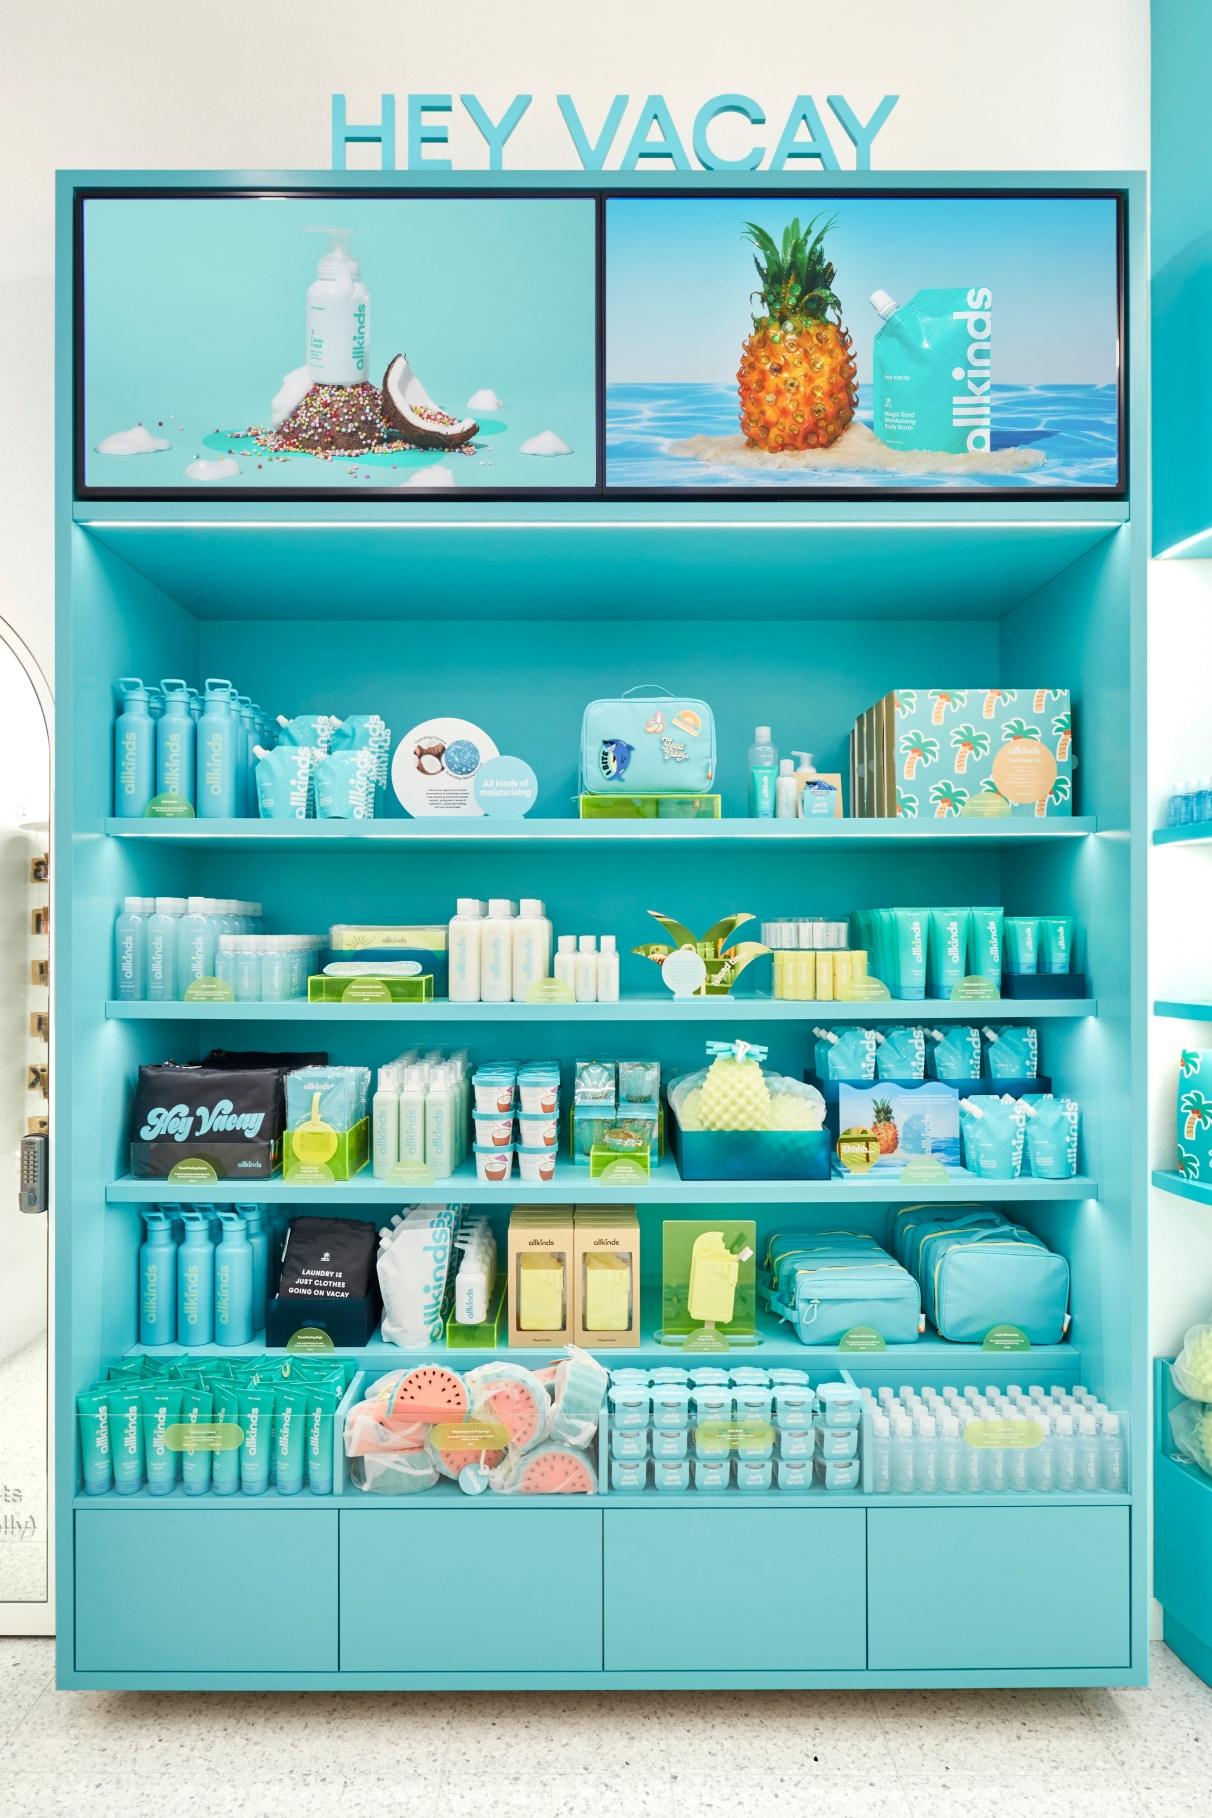 Allkinds Hey Vacay world display shelves